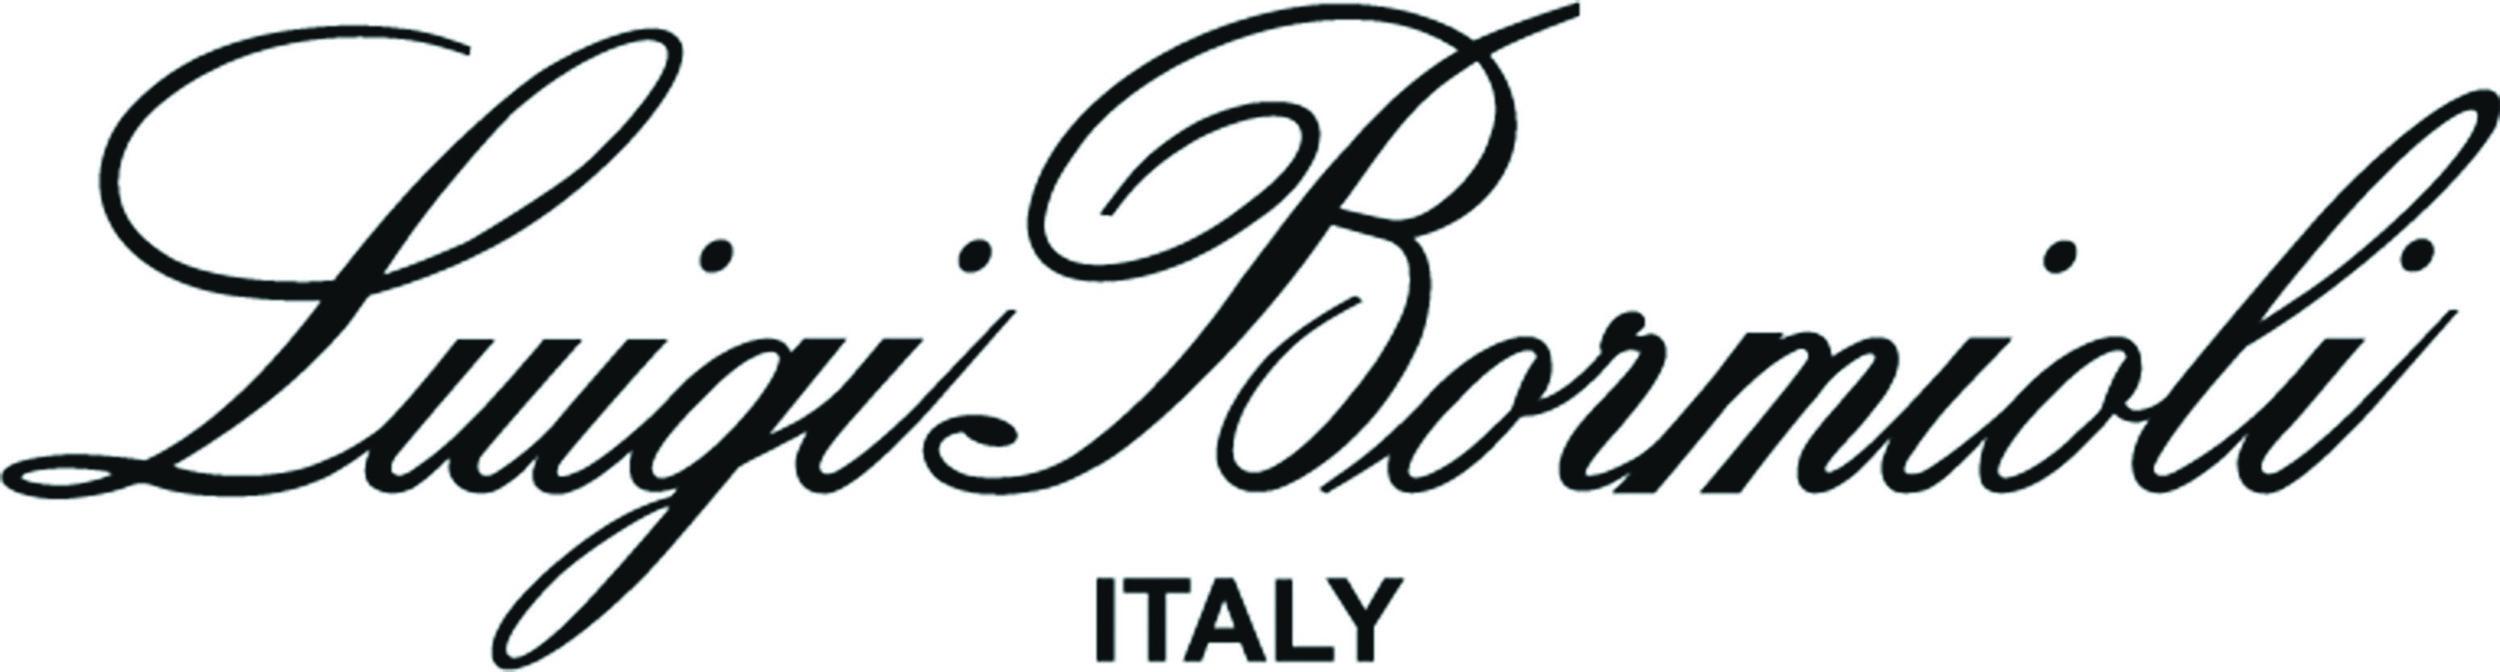 Luigi Bormioli ITALY Logo high res.jpg